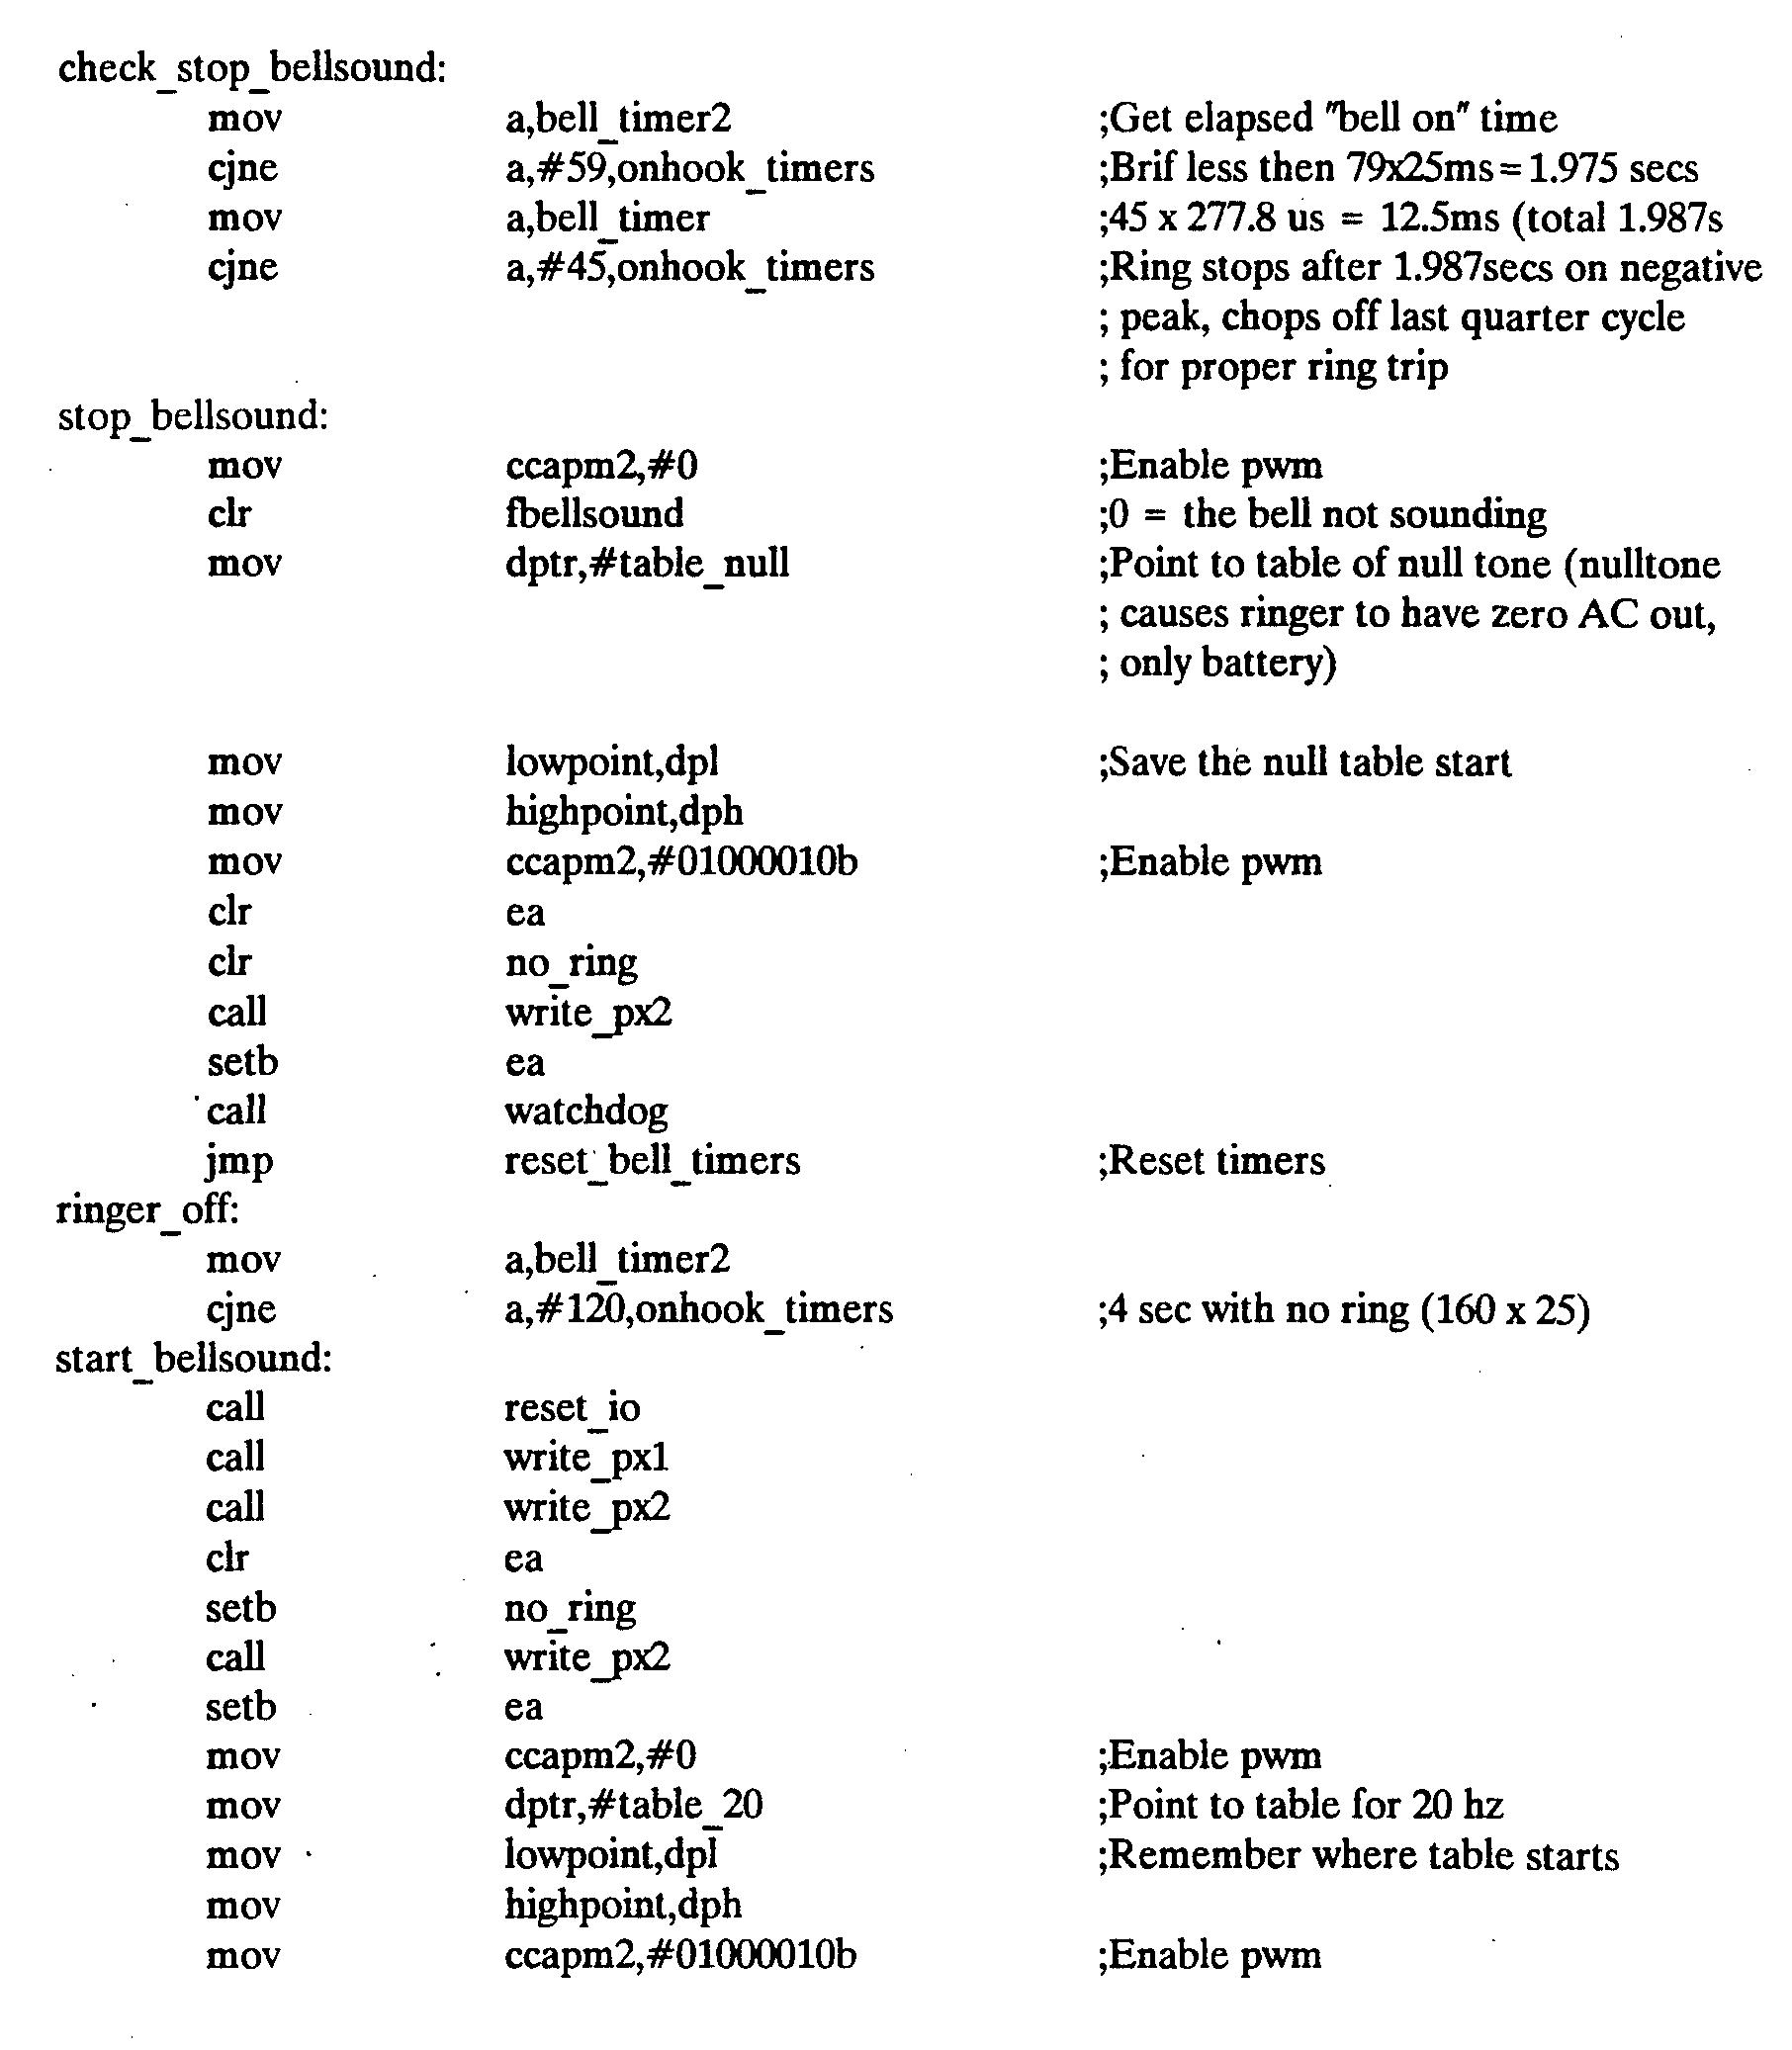 WO1994022255A1 - Self-diagnostic system for cellular-transceiver